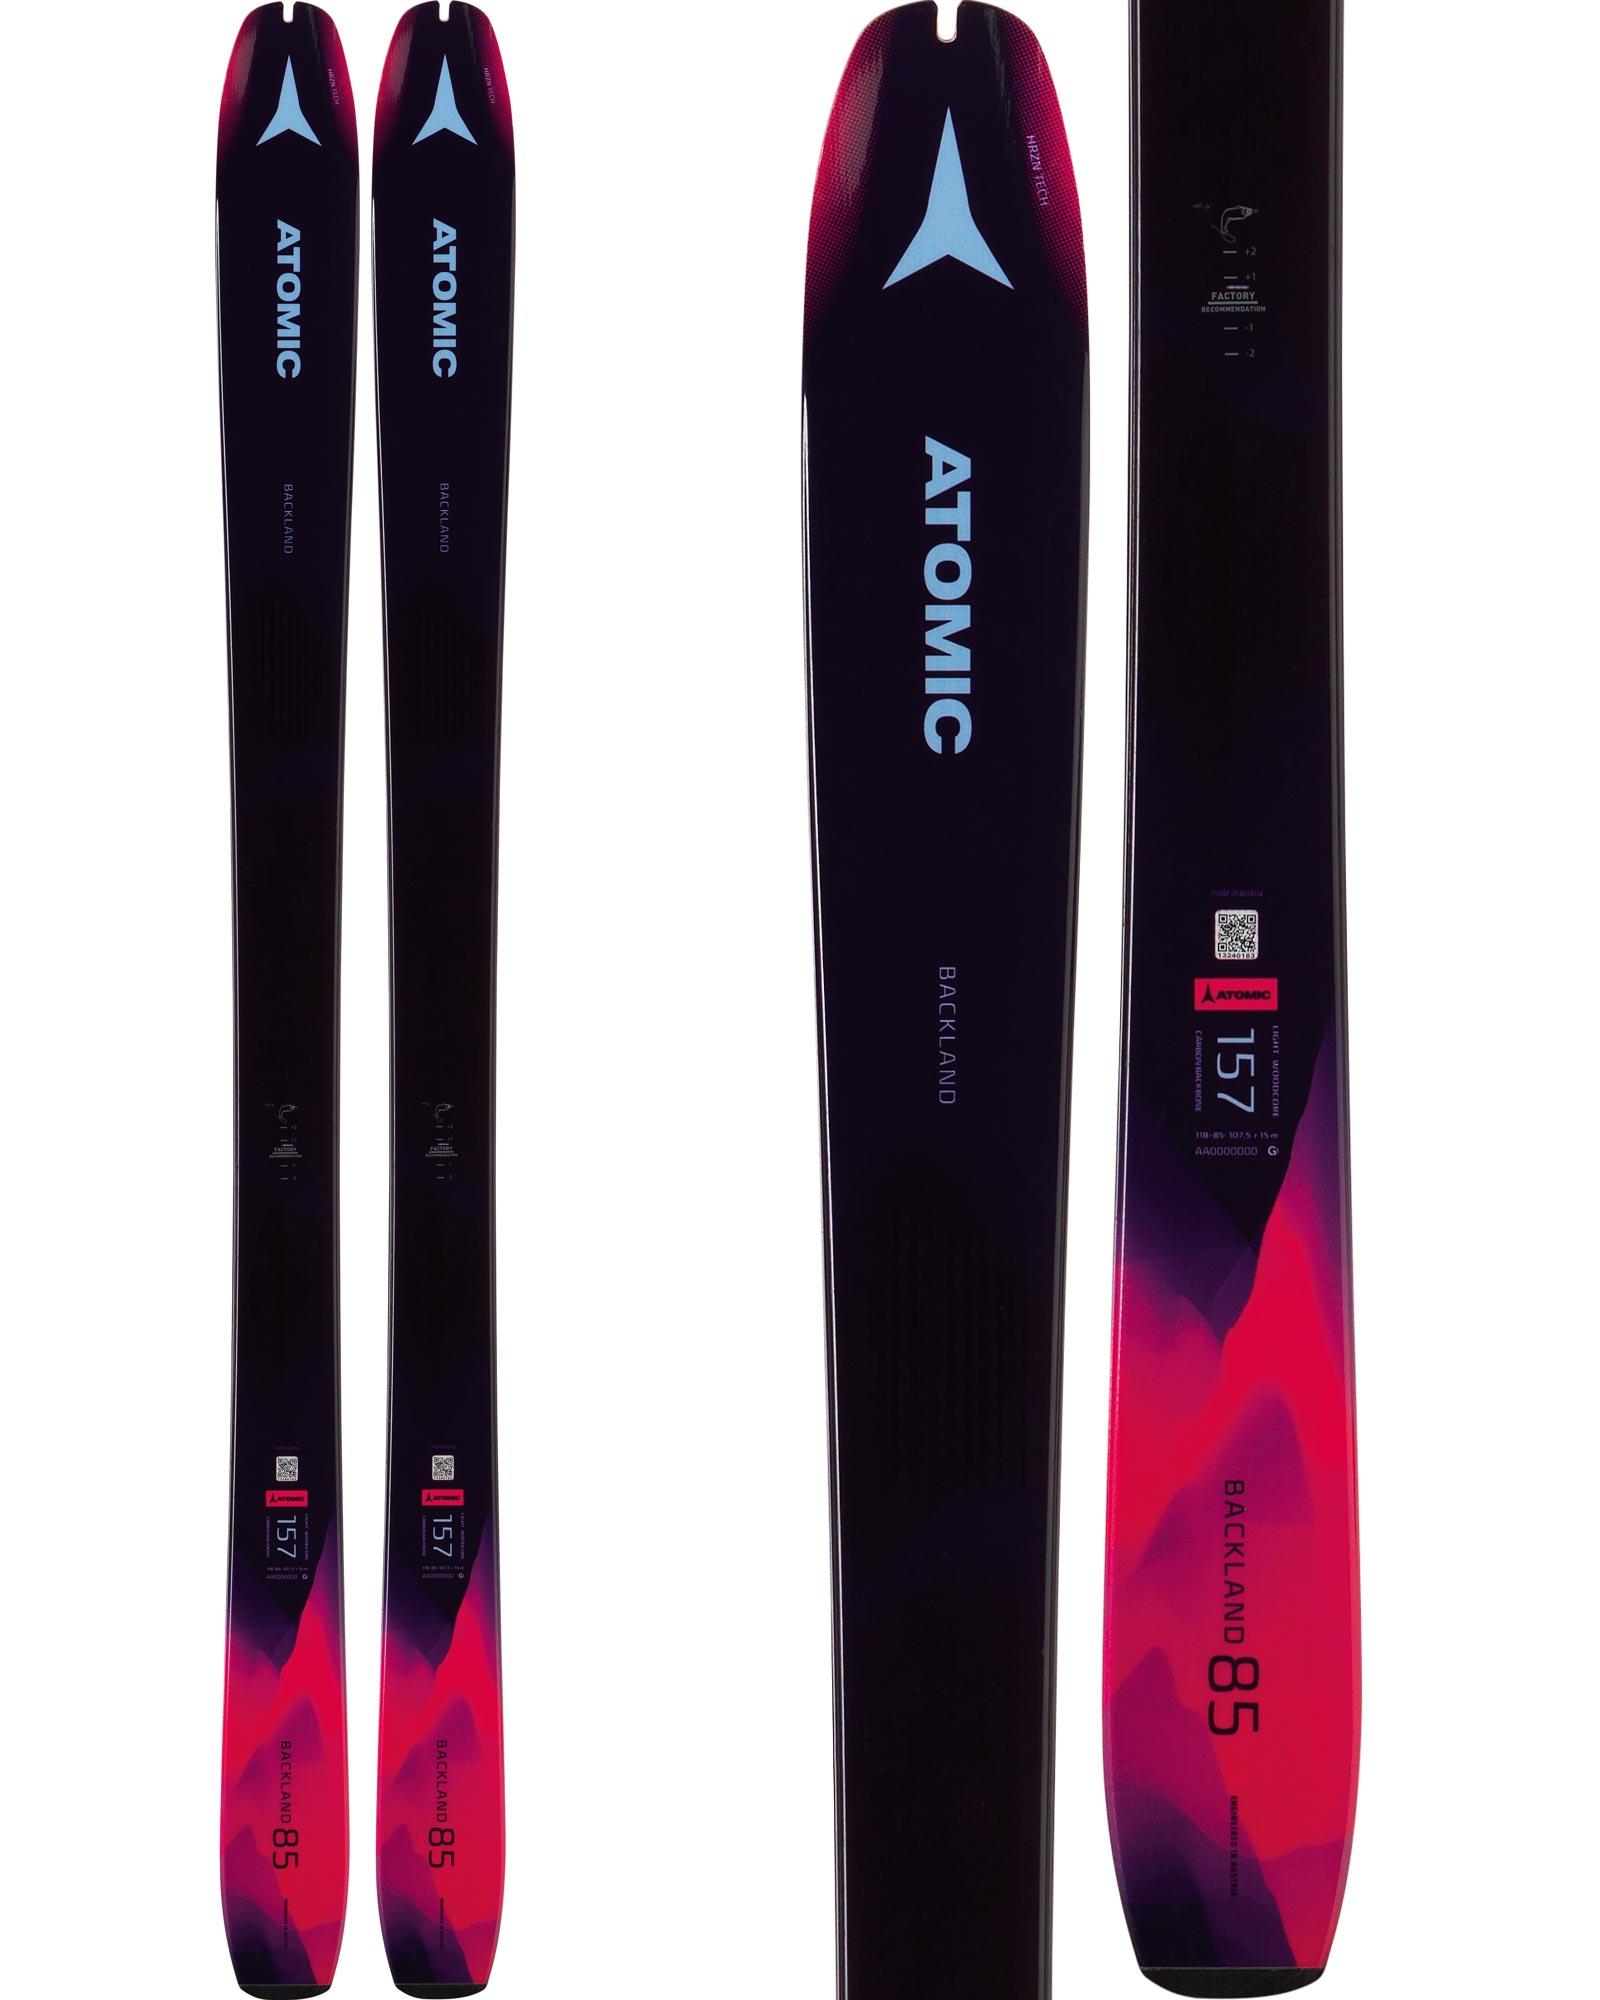 Atomic Backland 85 Women's Skis 2020 0